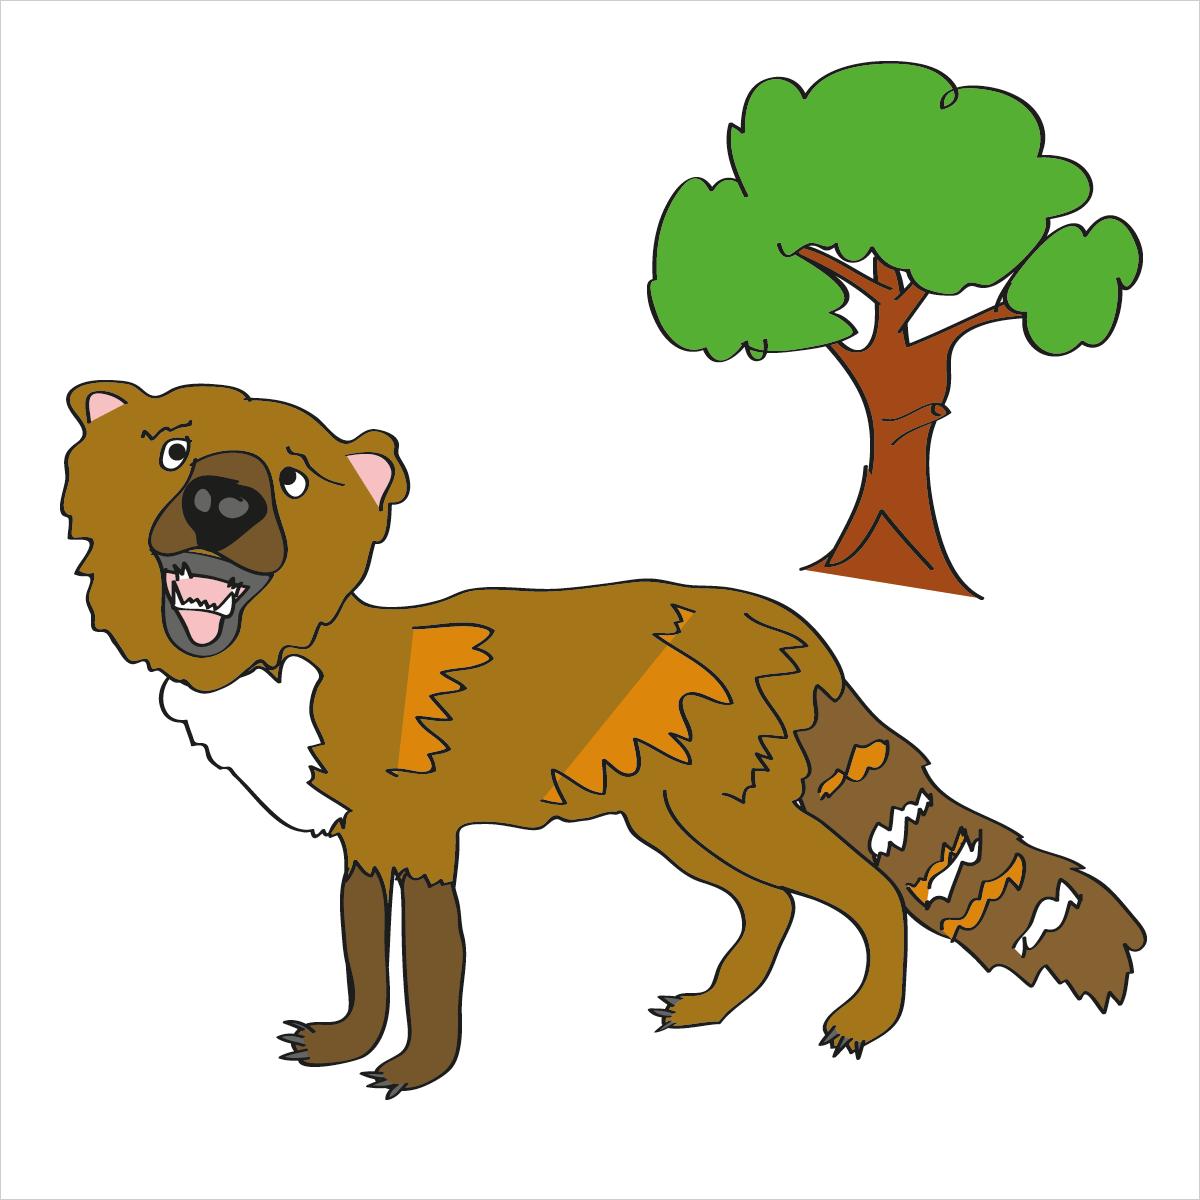 hybrid animals drawn for